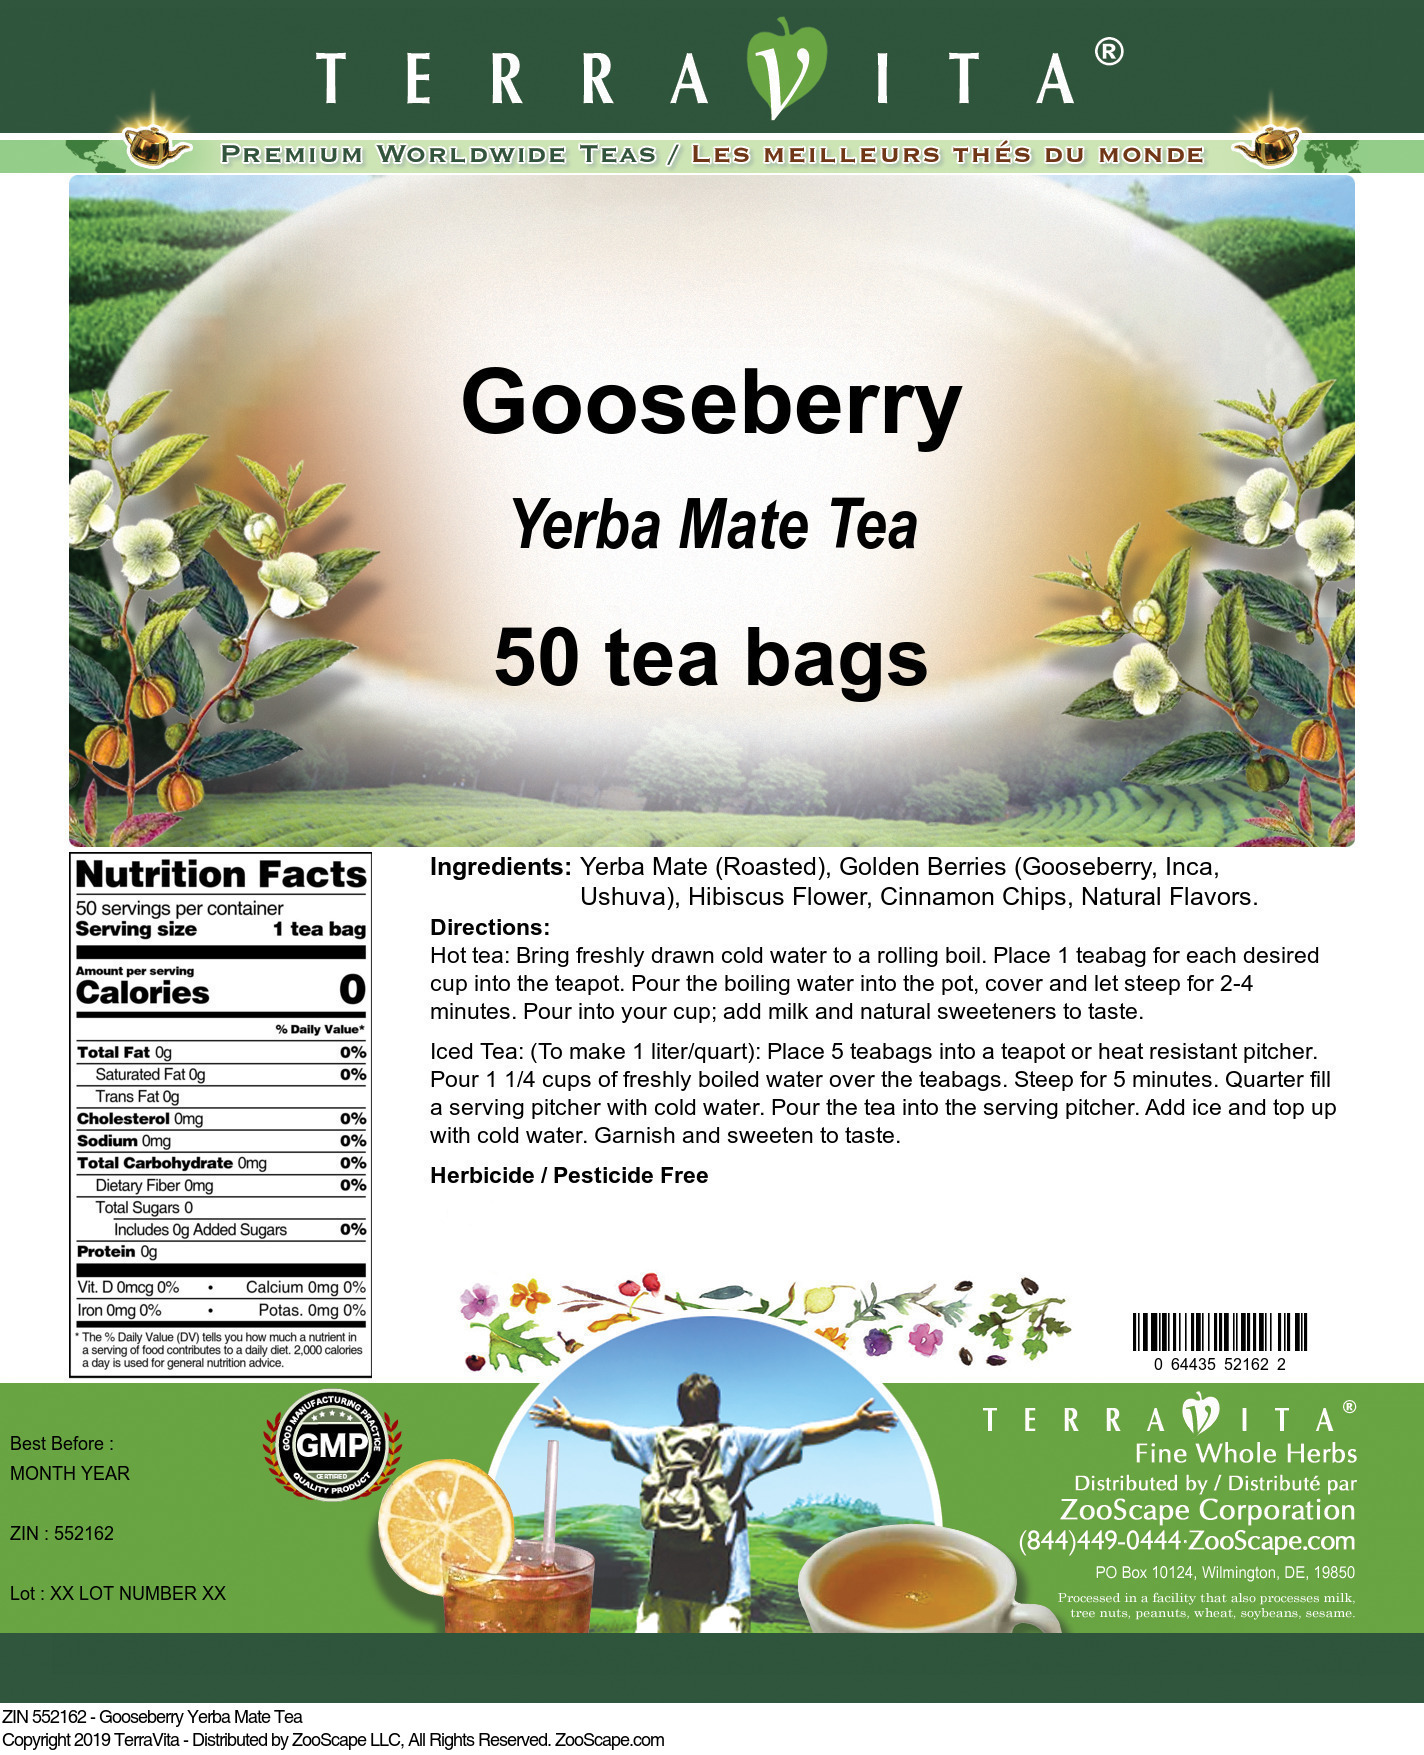 Gooseberry Yerba Mate Tea